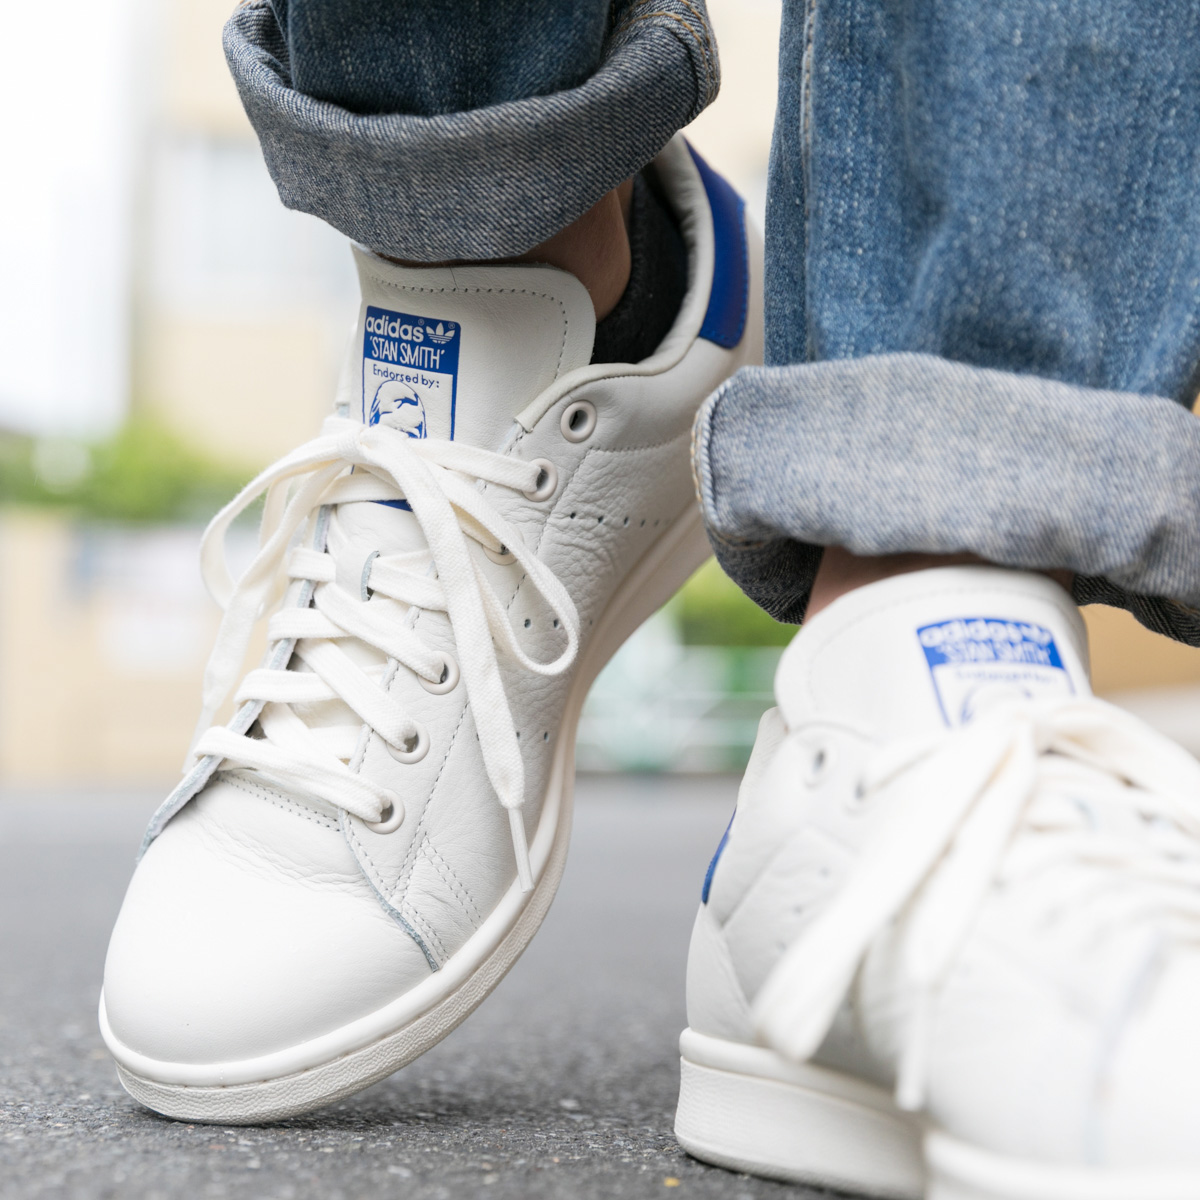 adidas Originals Stan Smith(アディダス オリジナルス スタンスミス)Chalk White/Chalk White/College Royal【メンズ レディース スニーカー】18FW-I